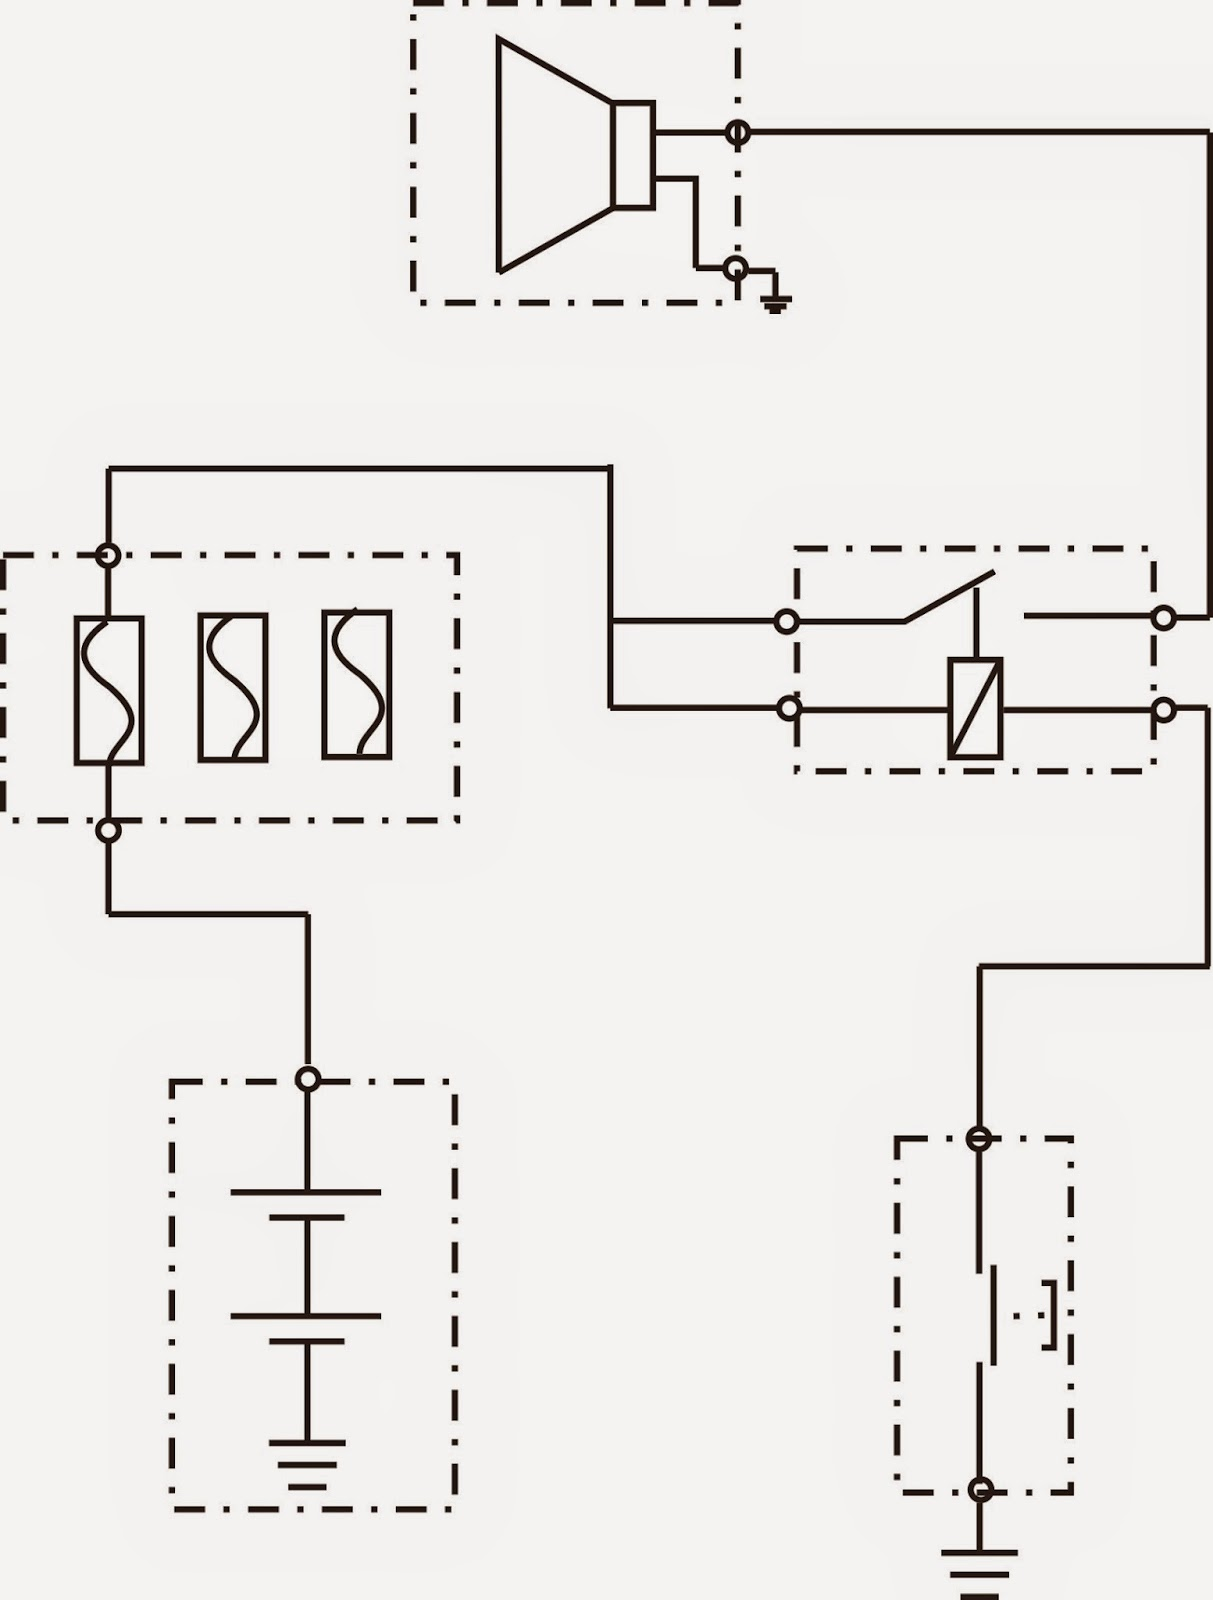 hella timer relay wiring diagram